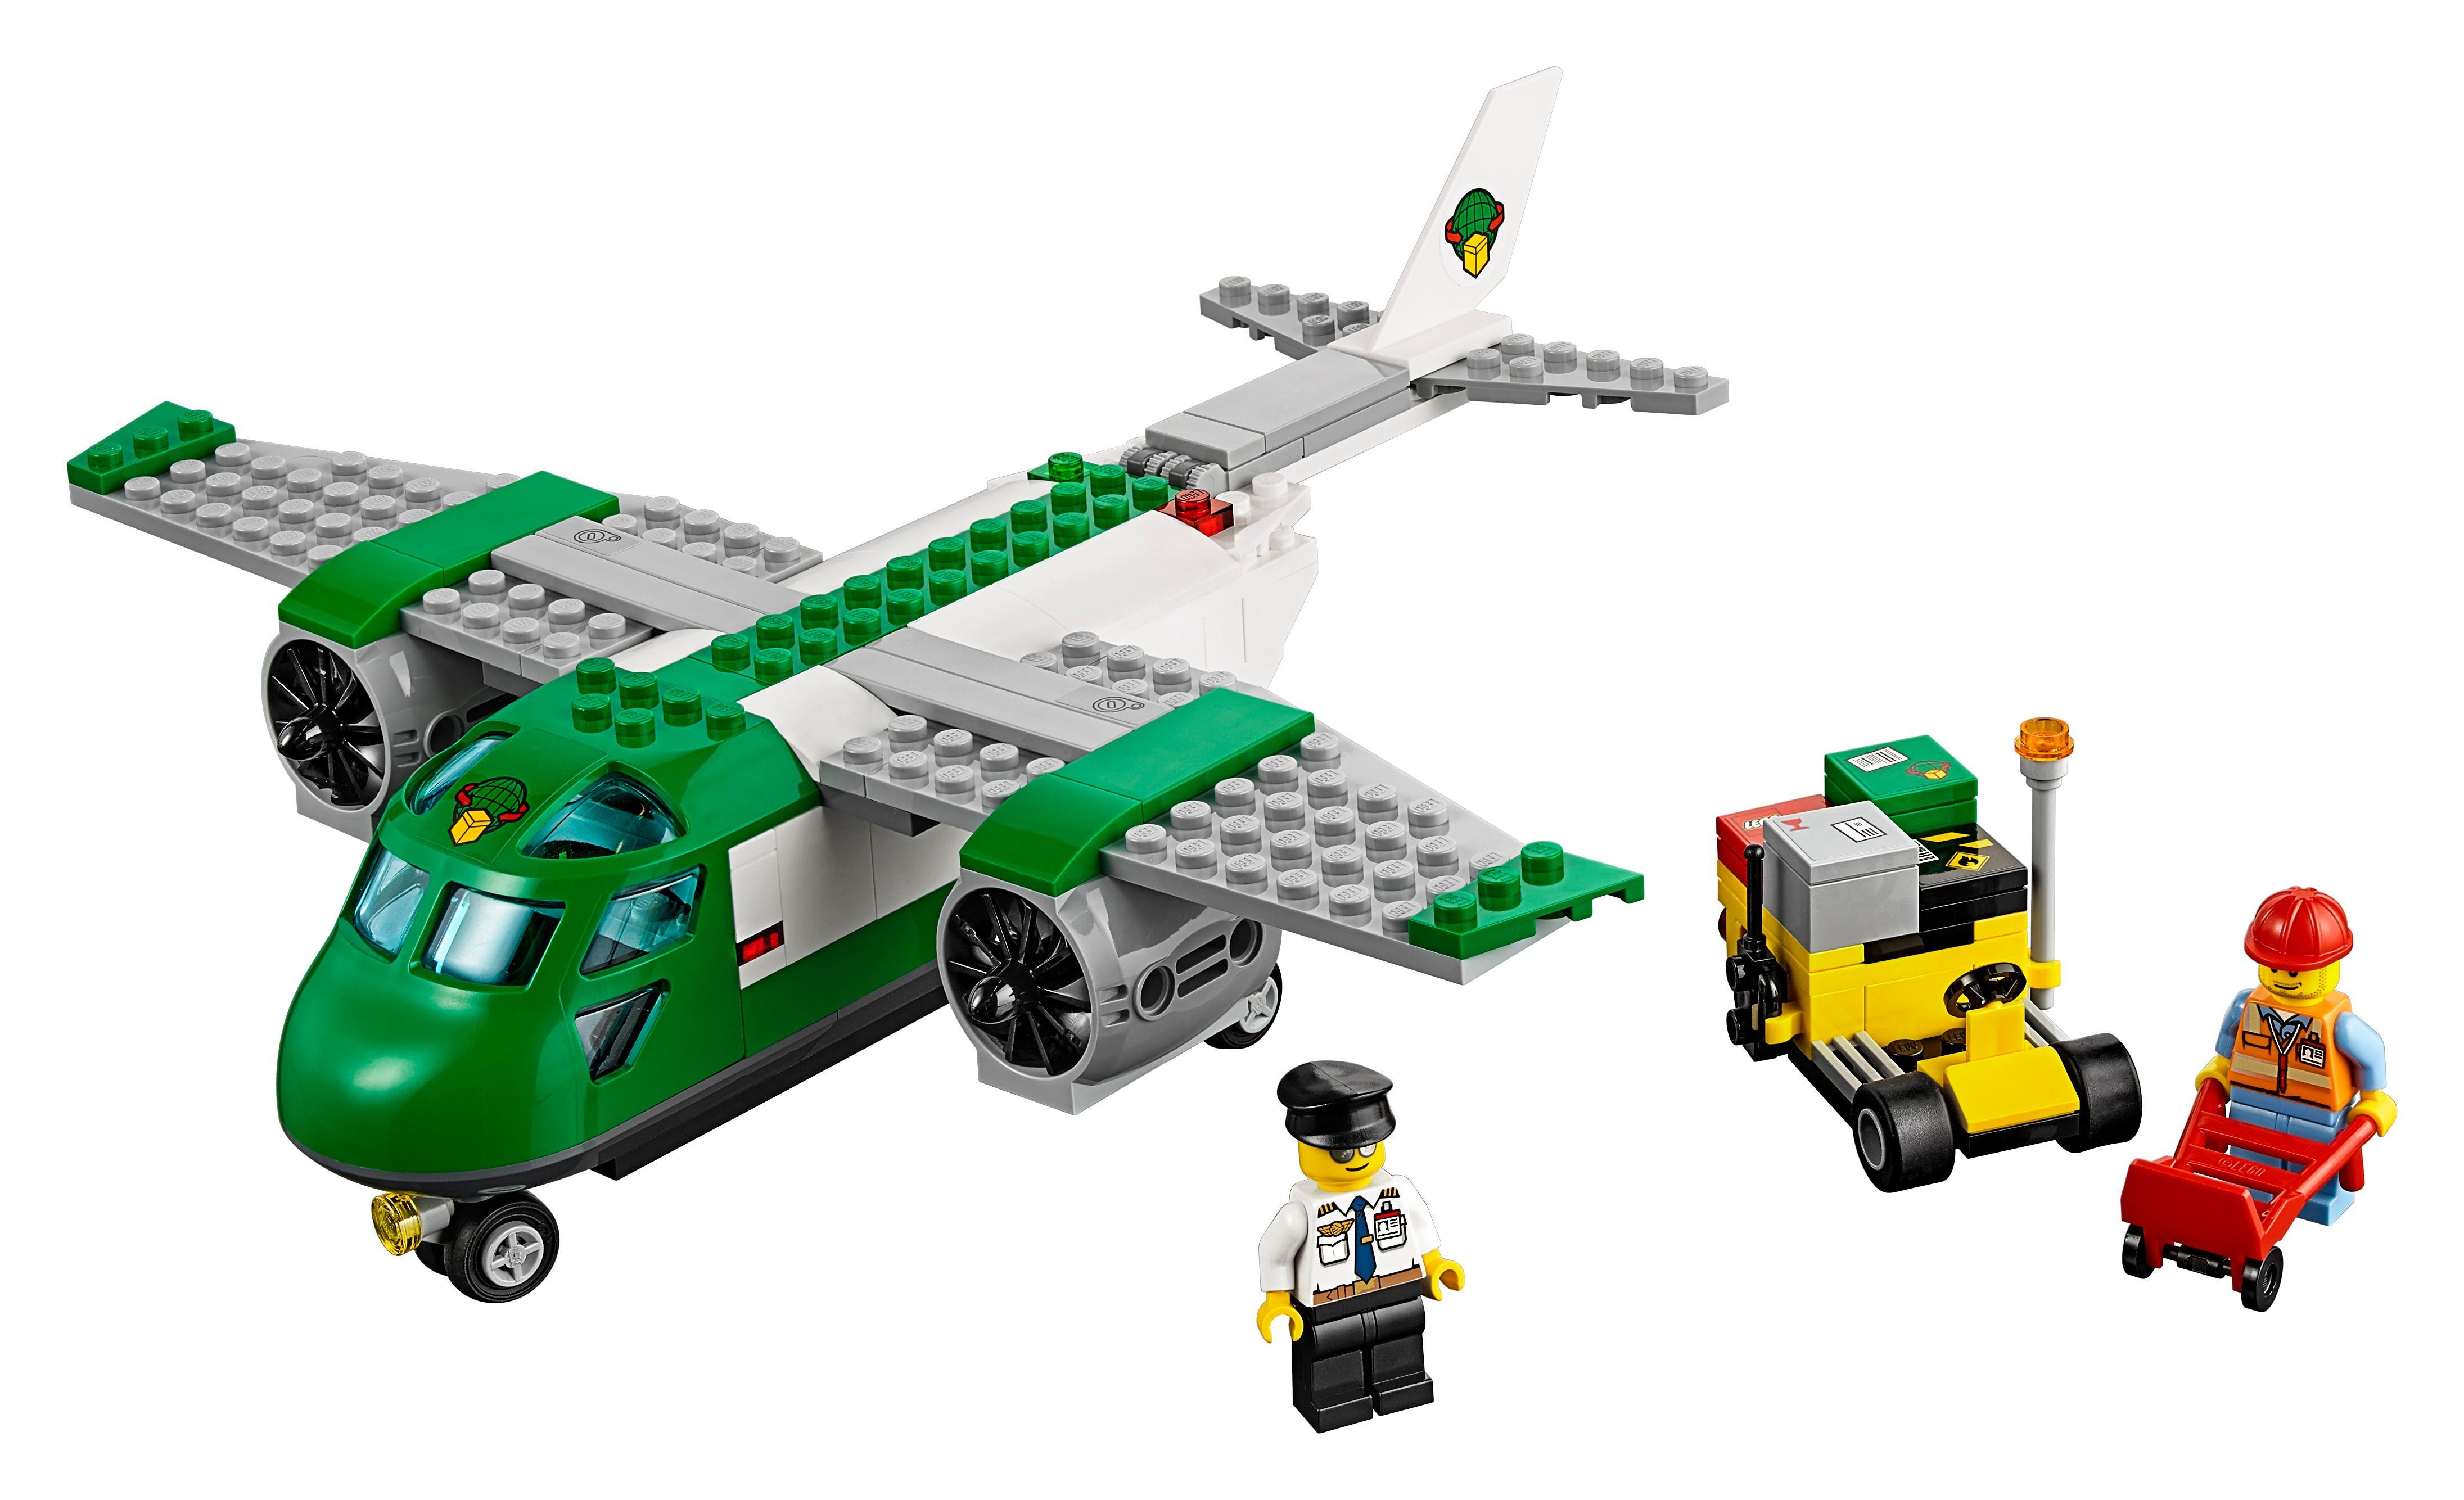 Aeroporto Lego : Lego city airport avião de carga do aeroporto lego